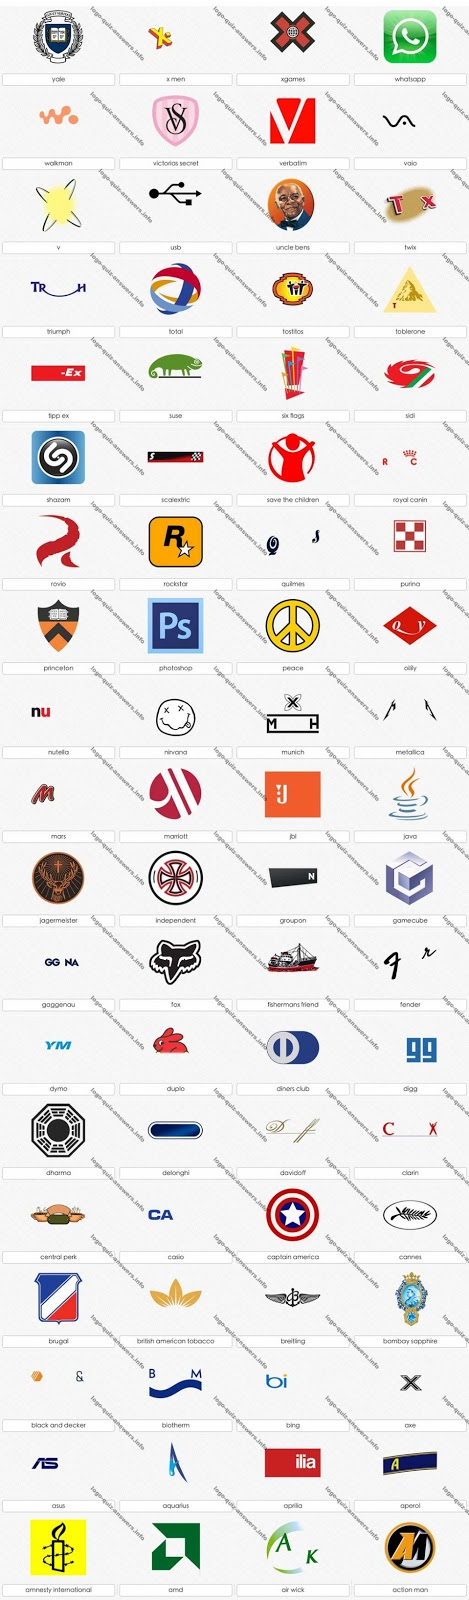 TEK: logo quiz answers levels